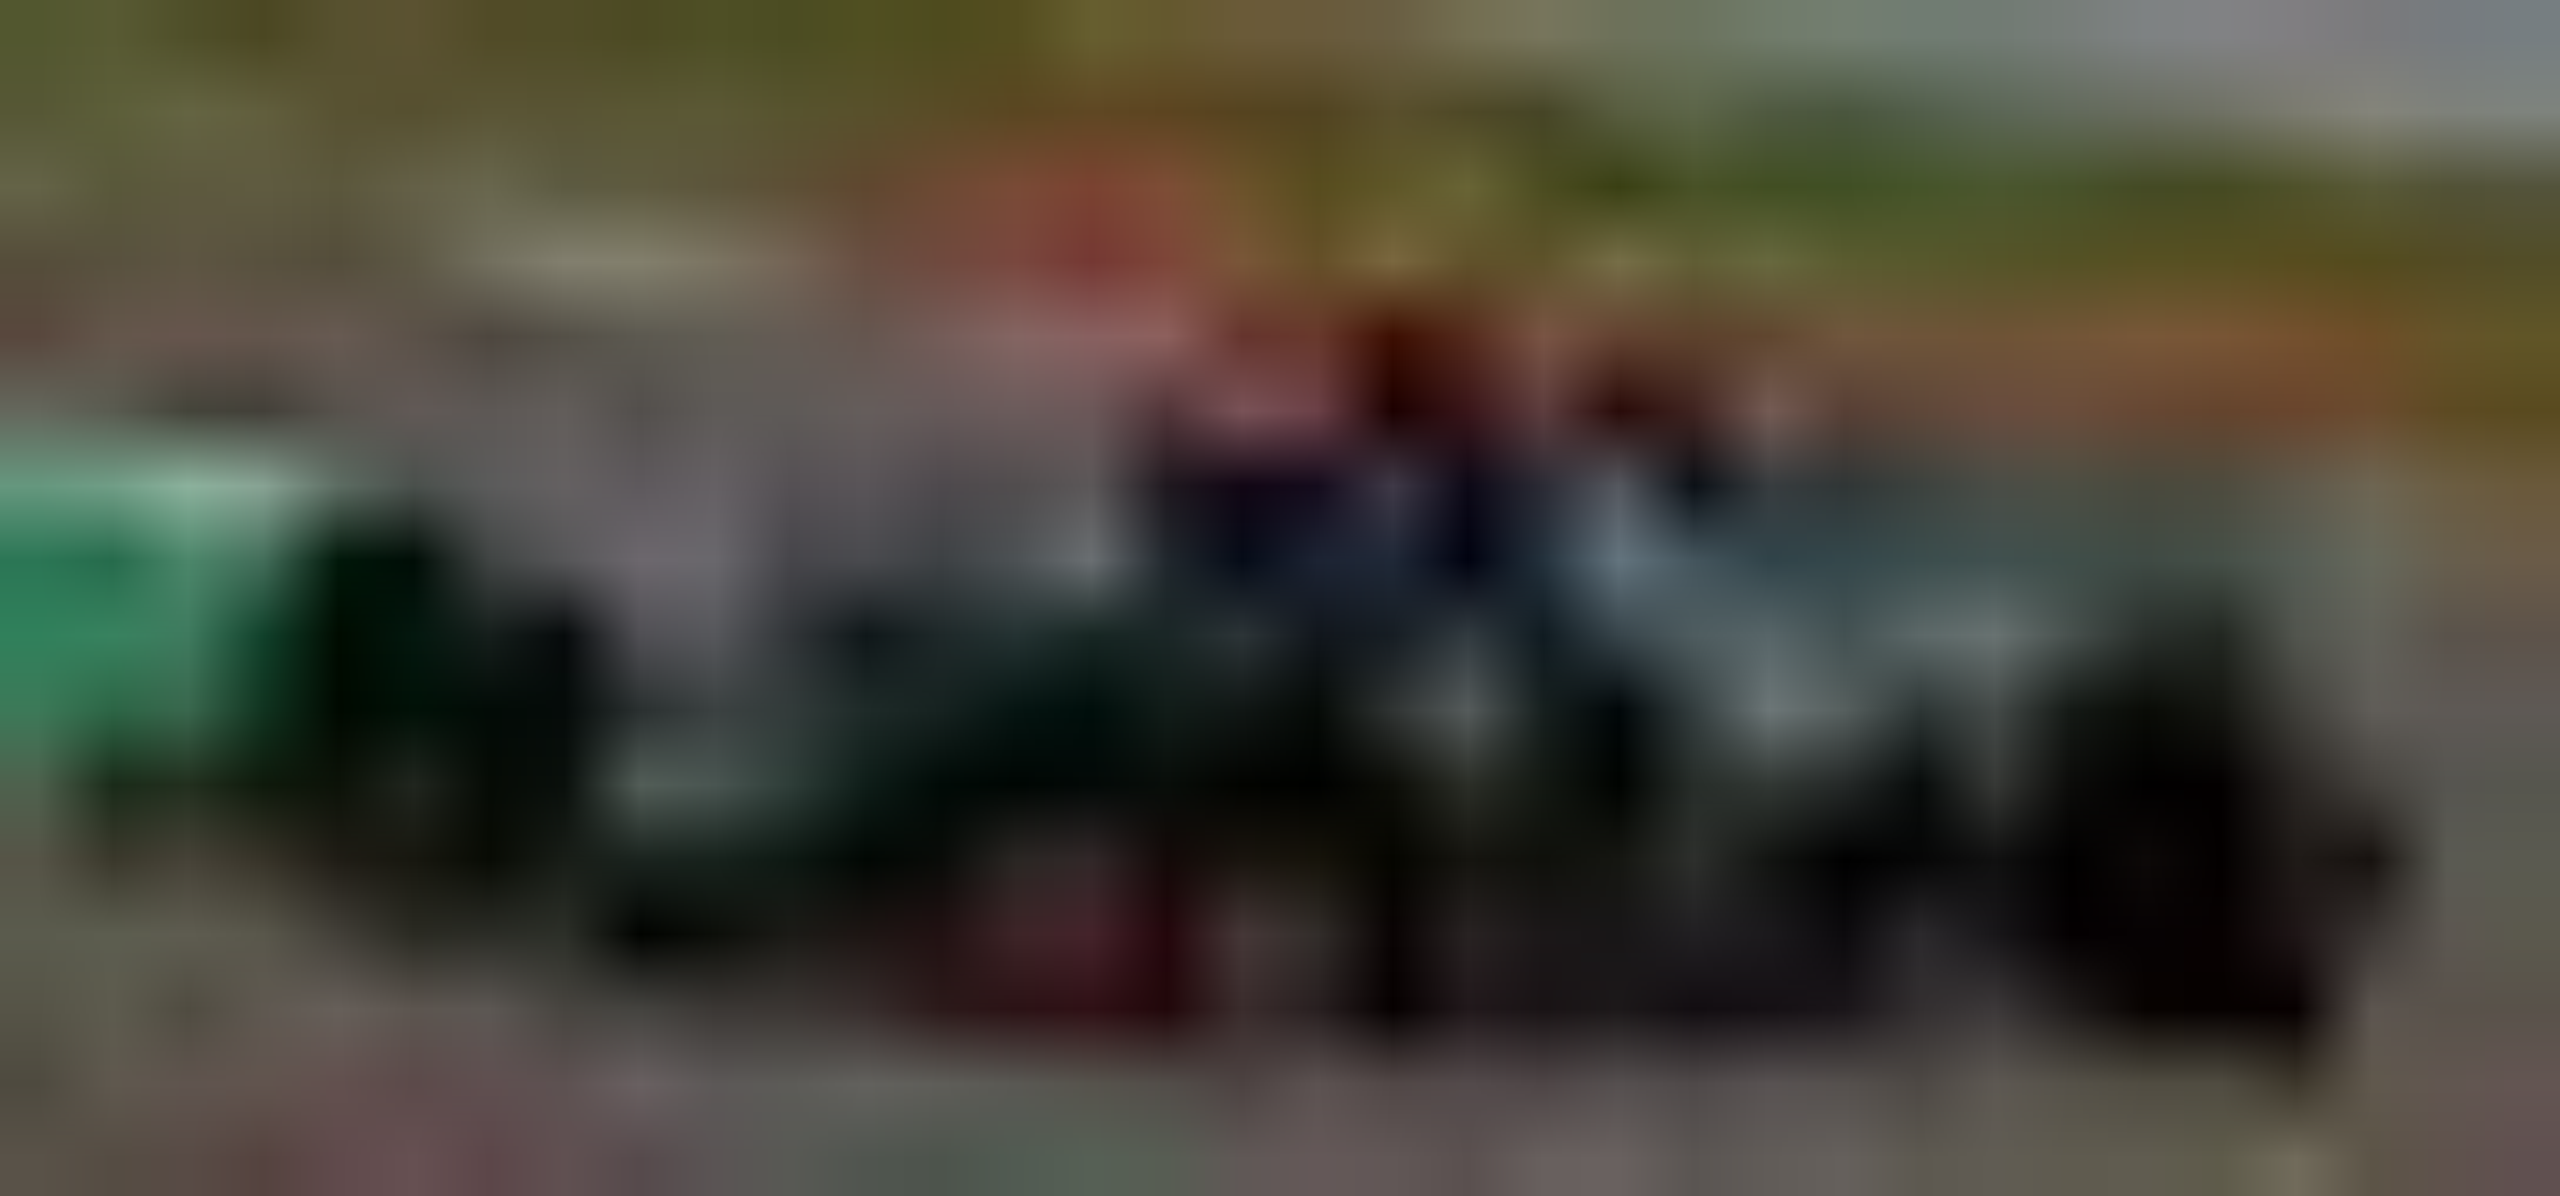 Formel 1: Mercedes dominiert in Silverstone – 91. Hamilton-Pole